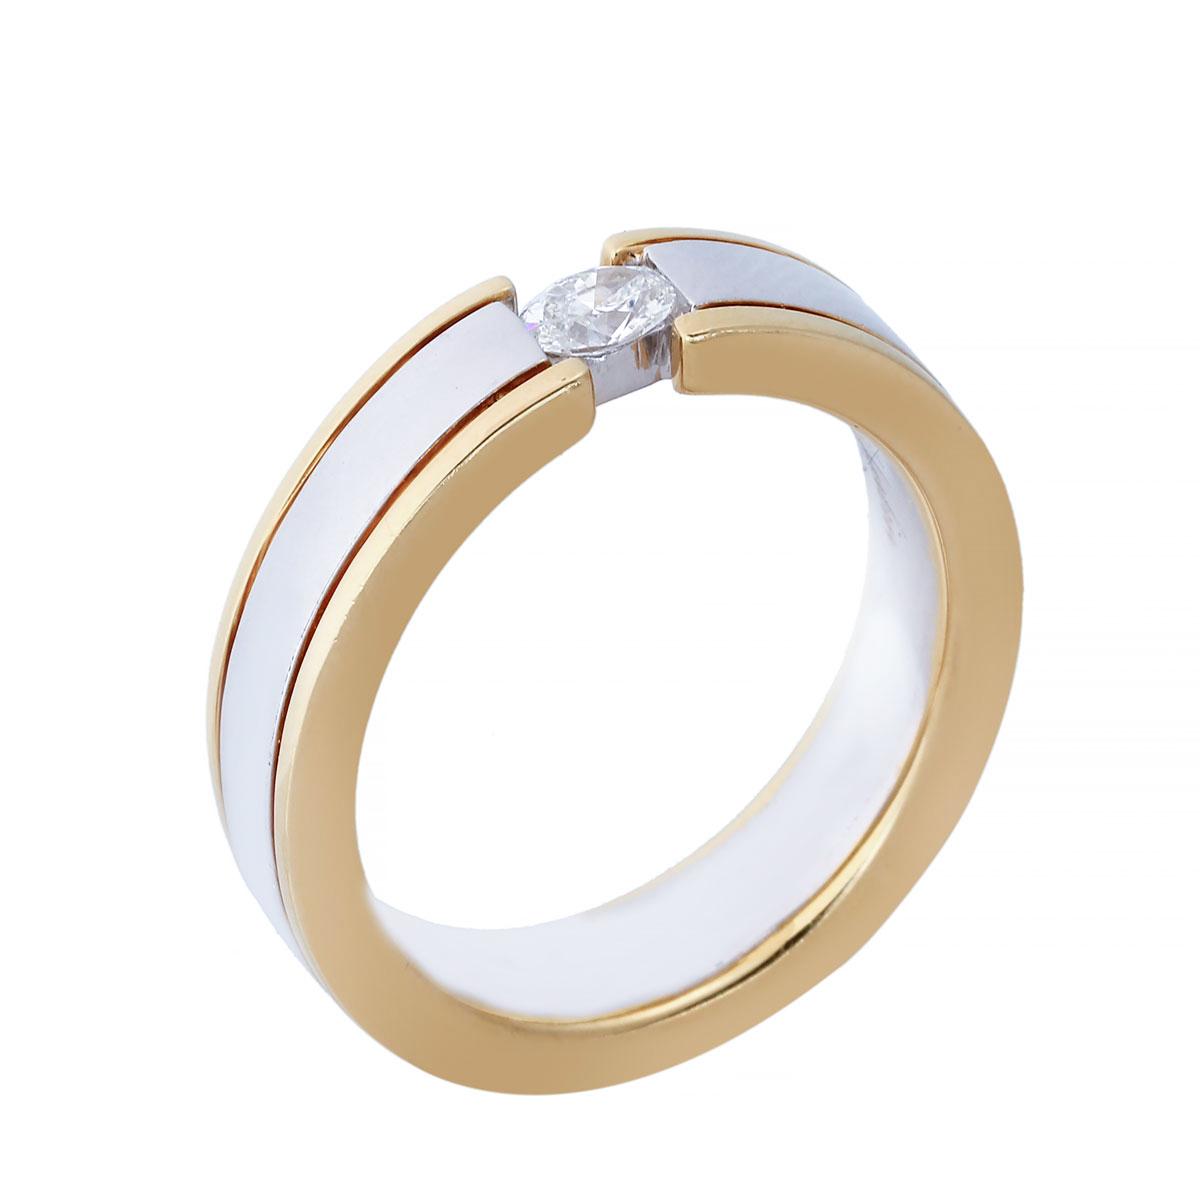 حلقه برليان 68856 C گوهربين goharbin